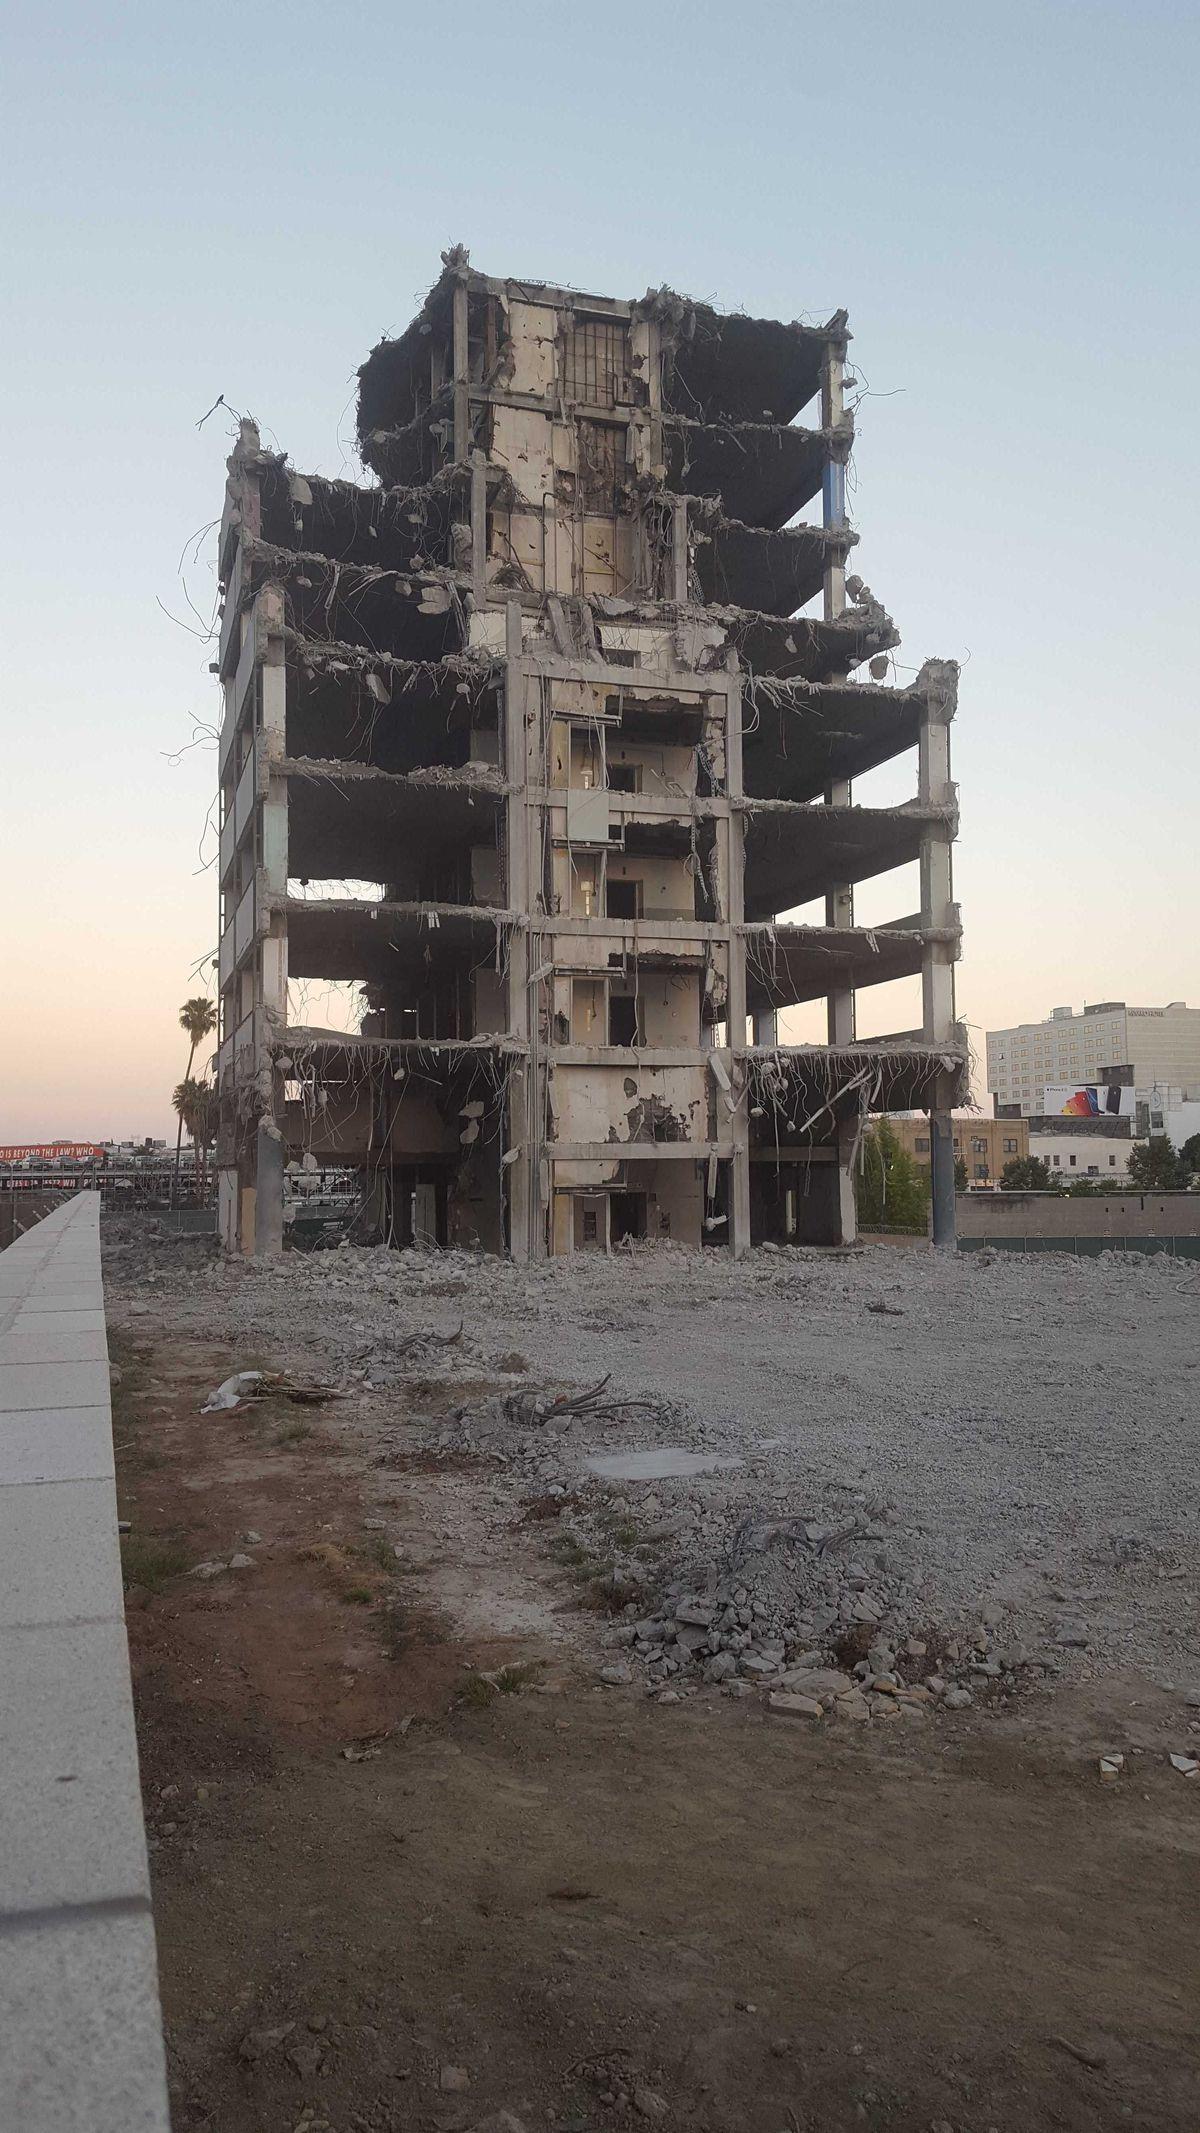 Parker Center demolition from ground level